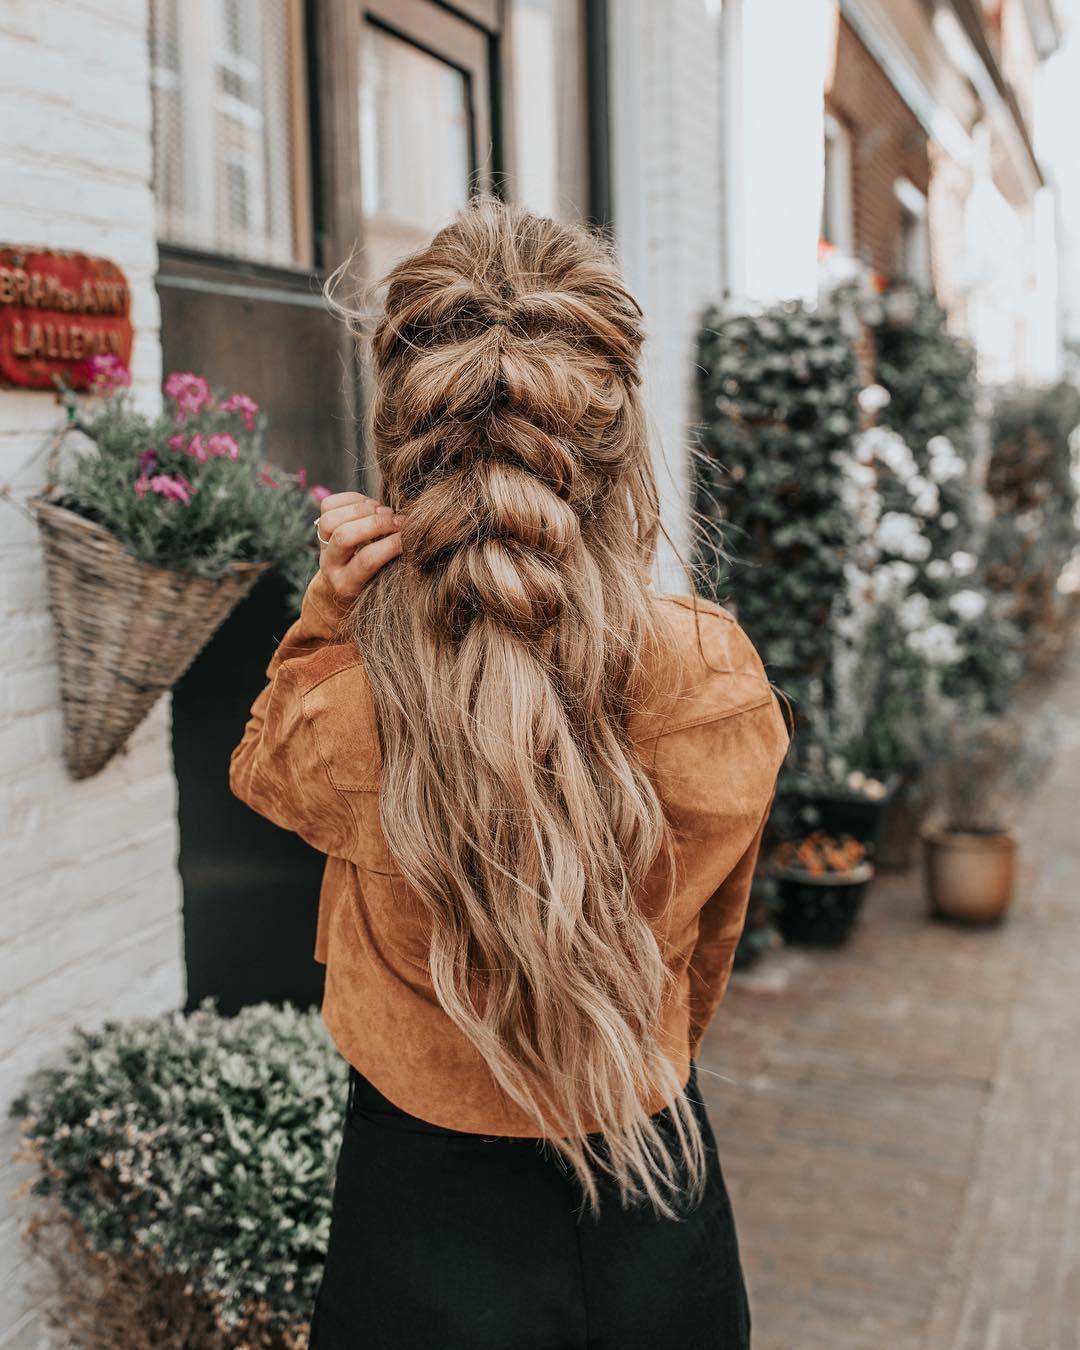 Hair Inspiration 2019-04-01 19:09:37